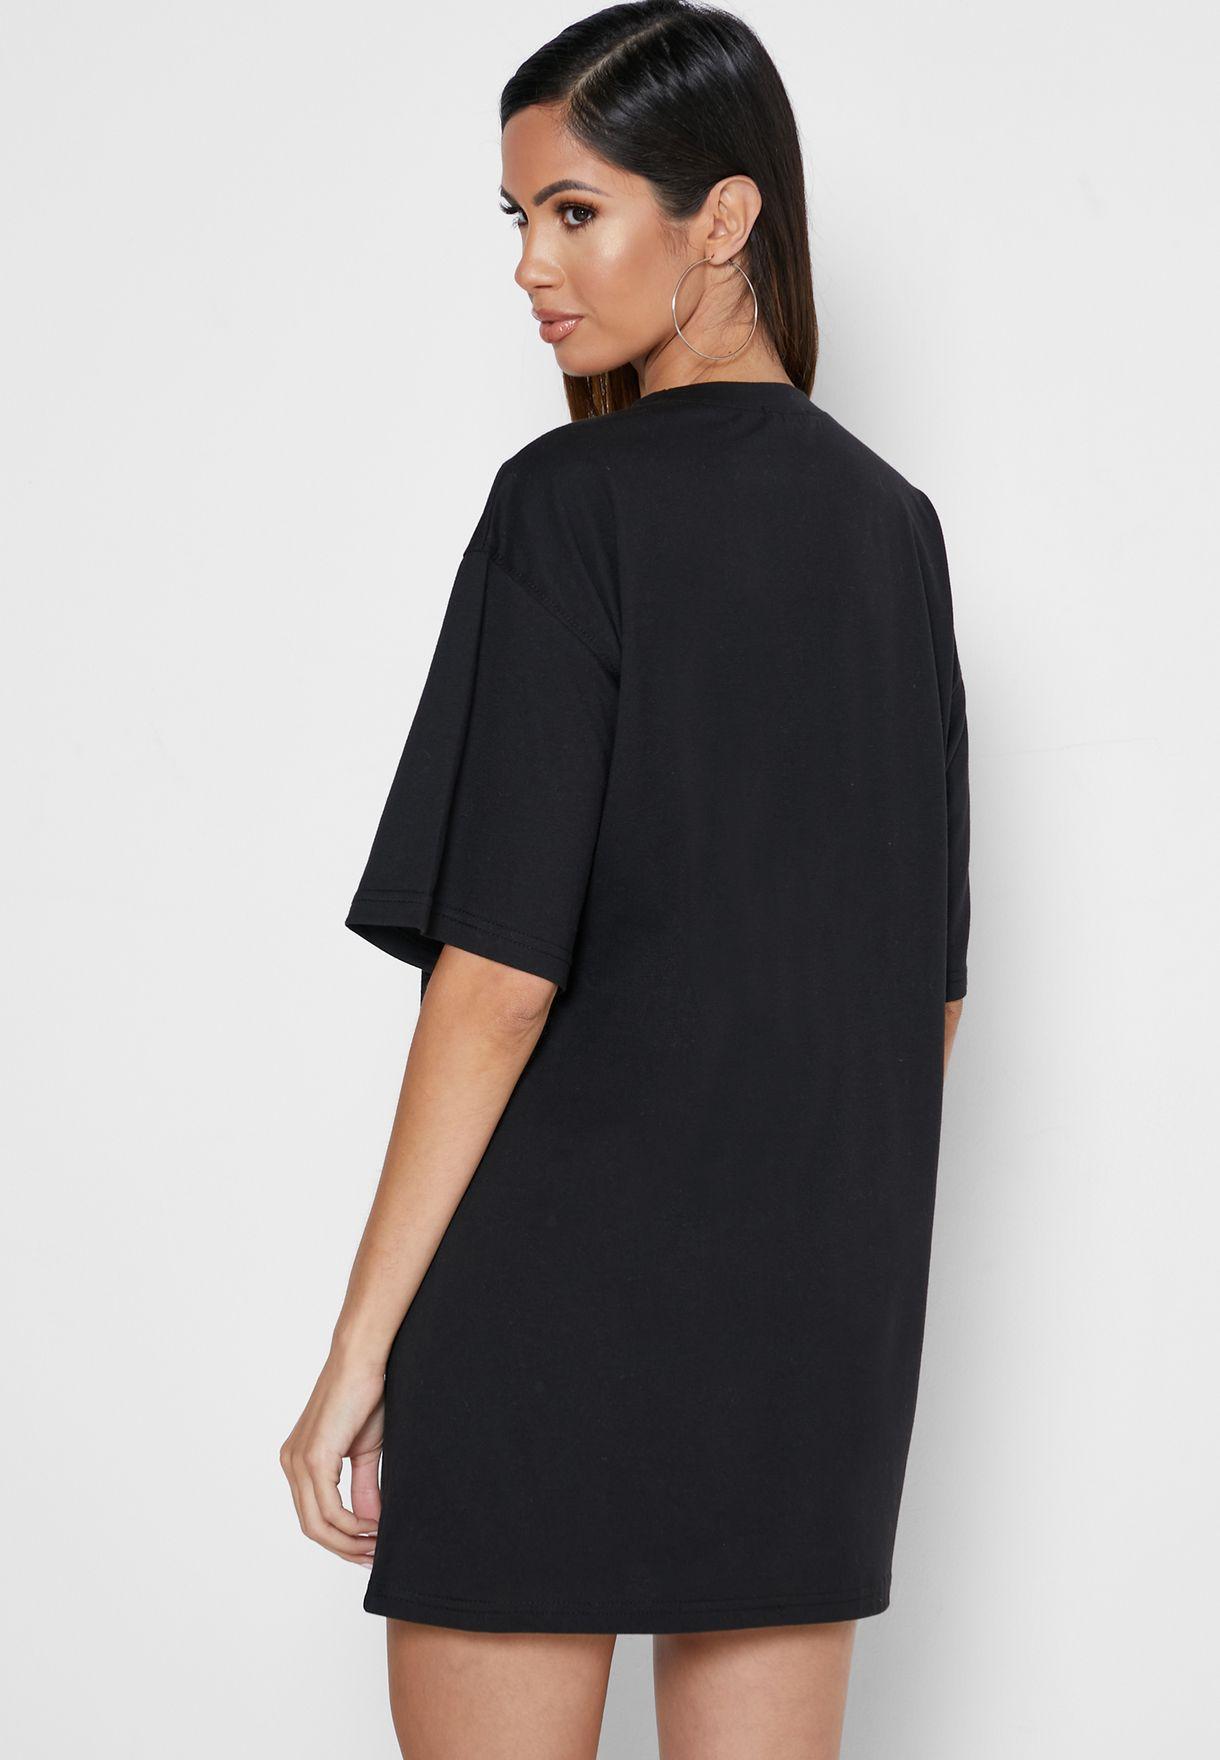 Slogan T-Shirt Dress